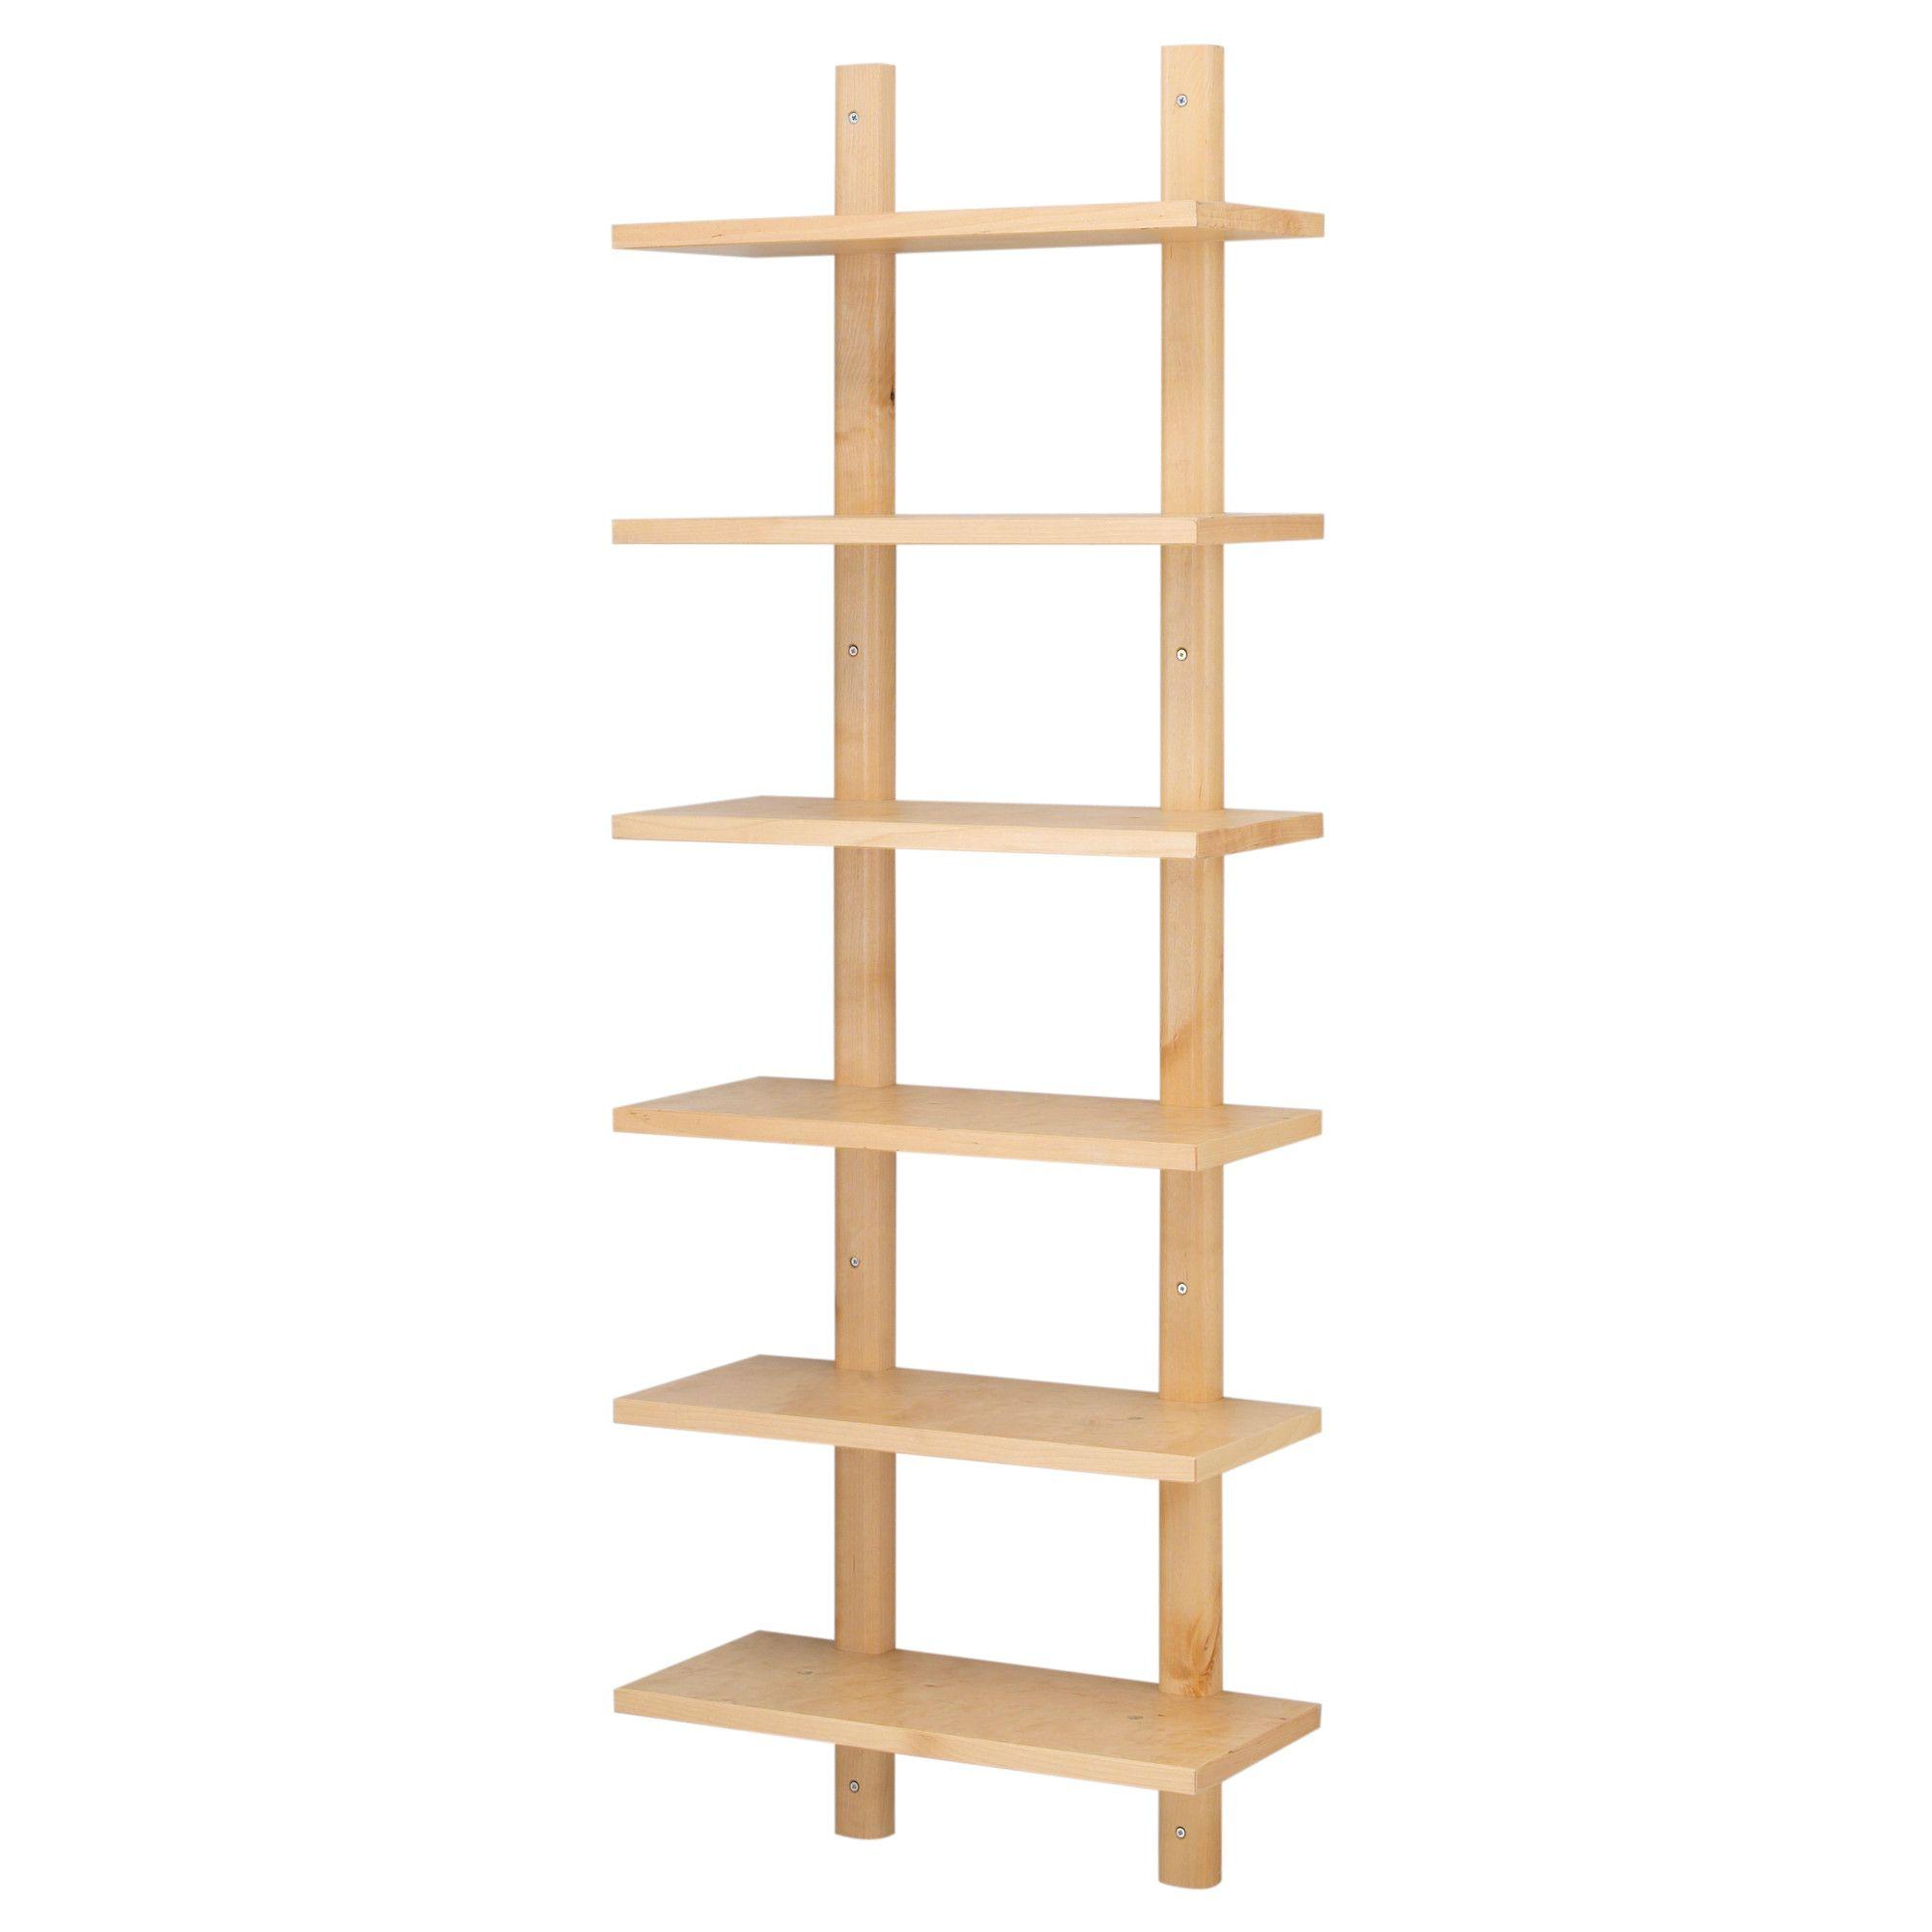 Ikea Us Furniture And Home Furnishings Wandregal Ikea Regalwand Wandregal